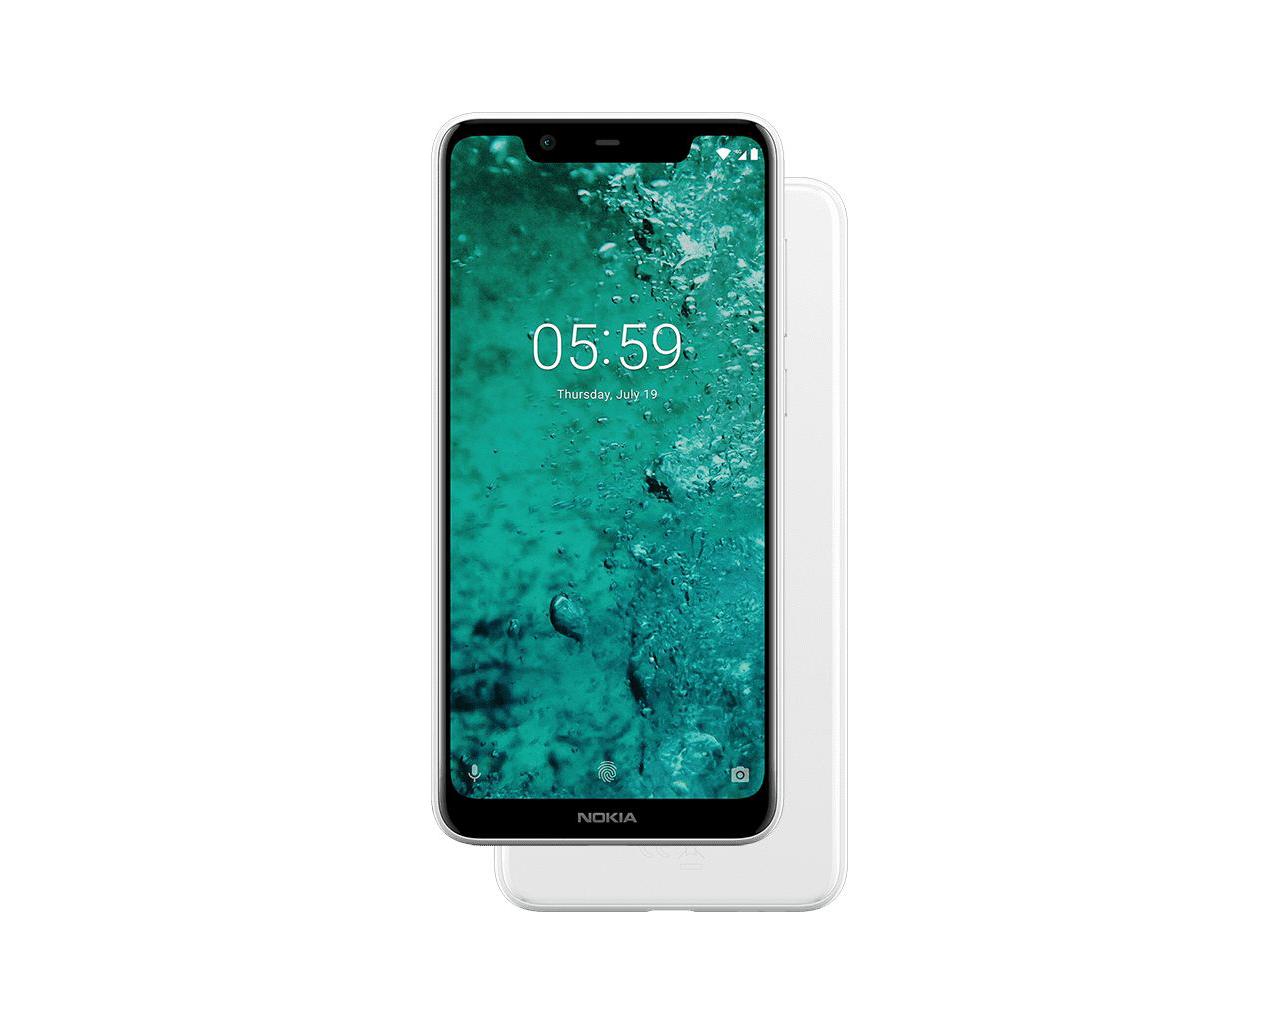 Nokia 5 系列 - Notebookcheck